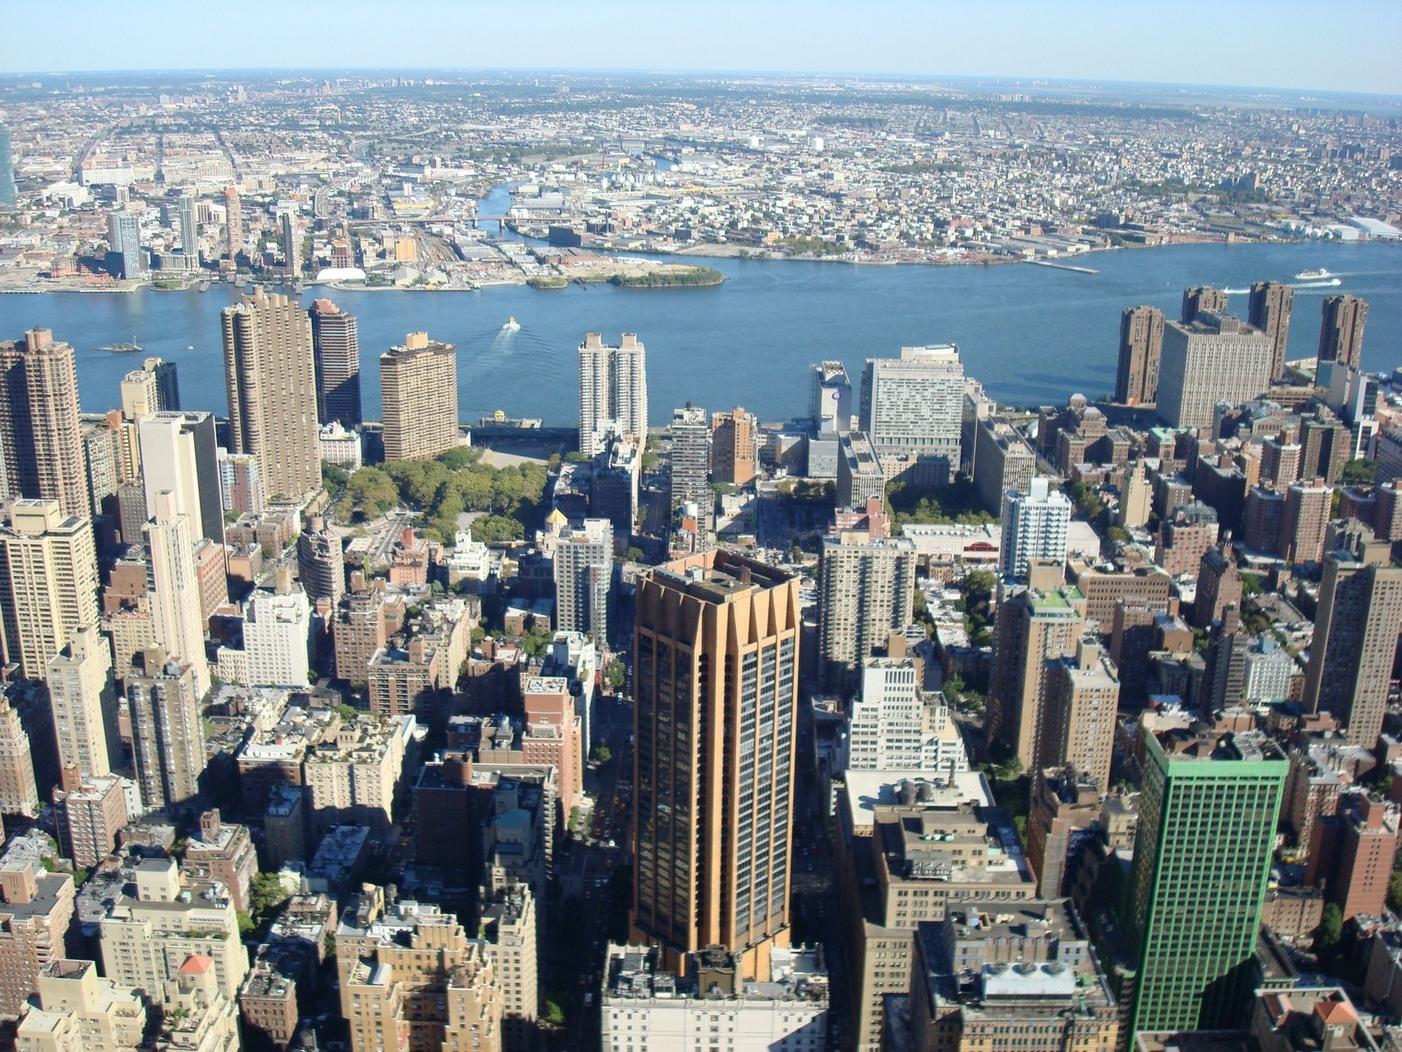 New York City_EmpireStateBuildingObservatory_ViewofMiddleManhattan_NiceBuildings